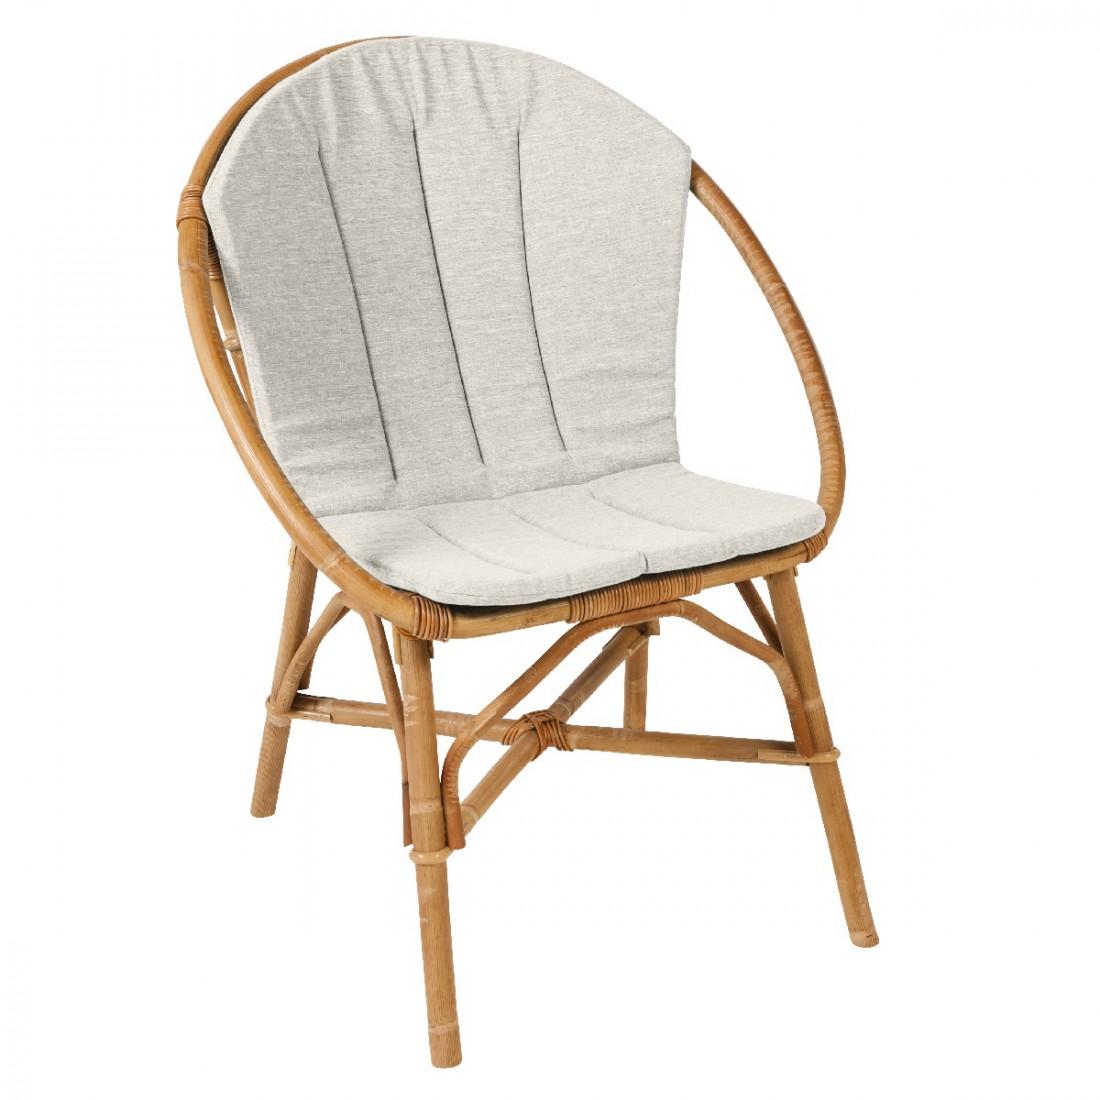 Optional Cushion For The Bruno Armchair